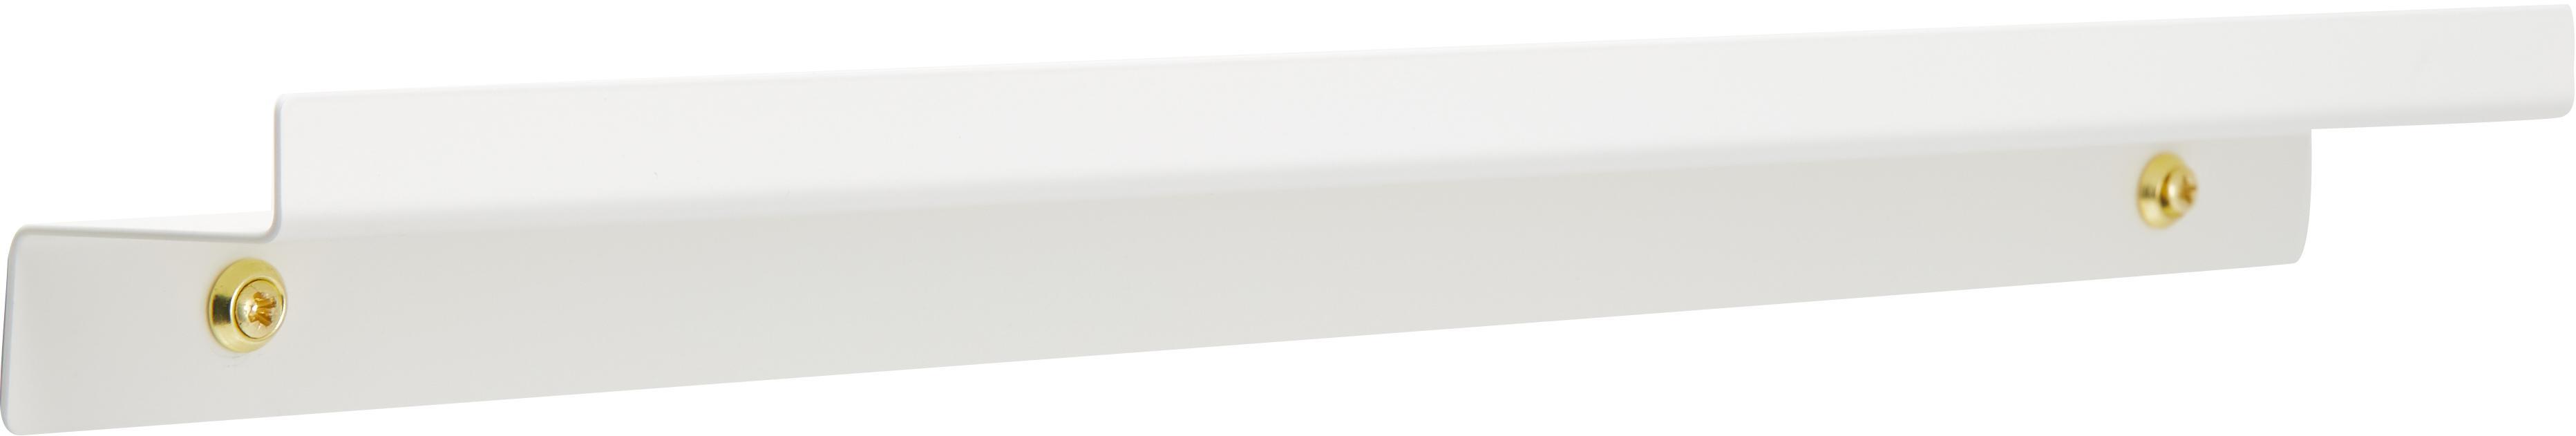 Portafotografie stretto in bianco Shelfini, Asta: metallo verniciato, Bianco, ottone, Larg. 50 x Alt. 6 cm